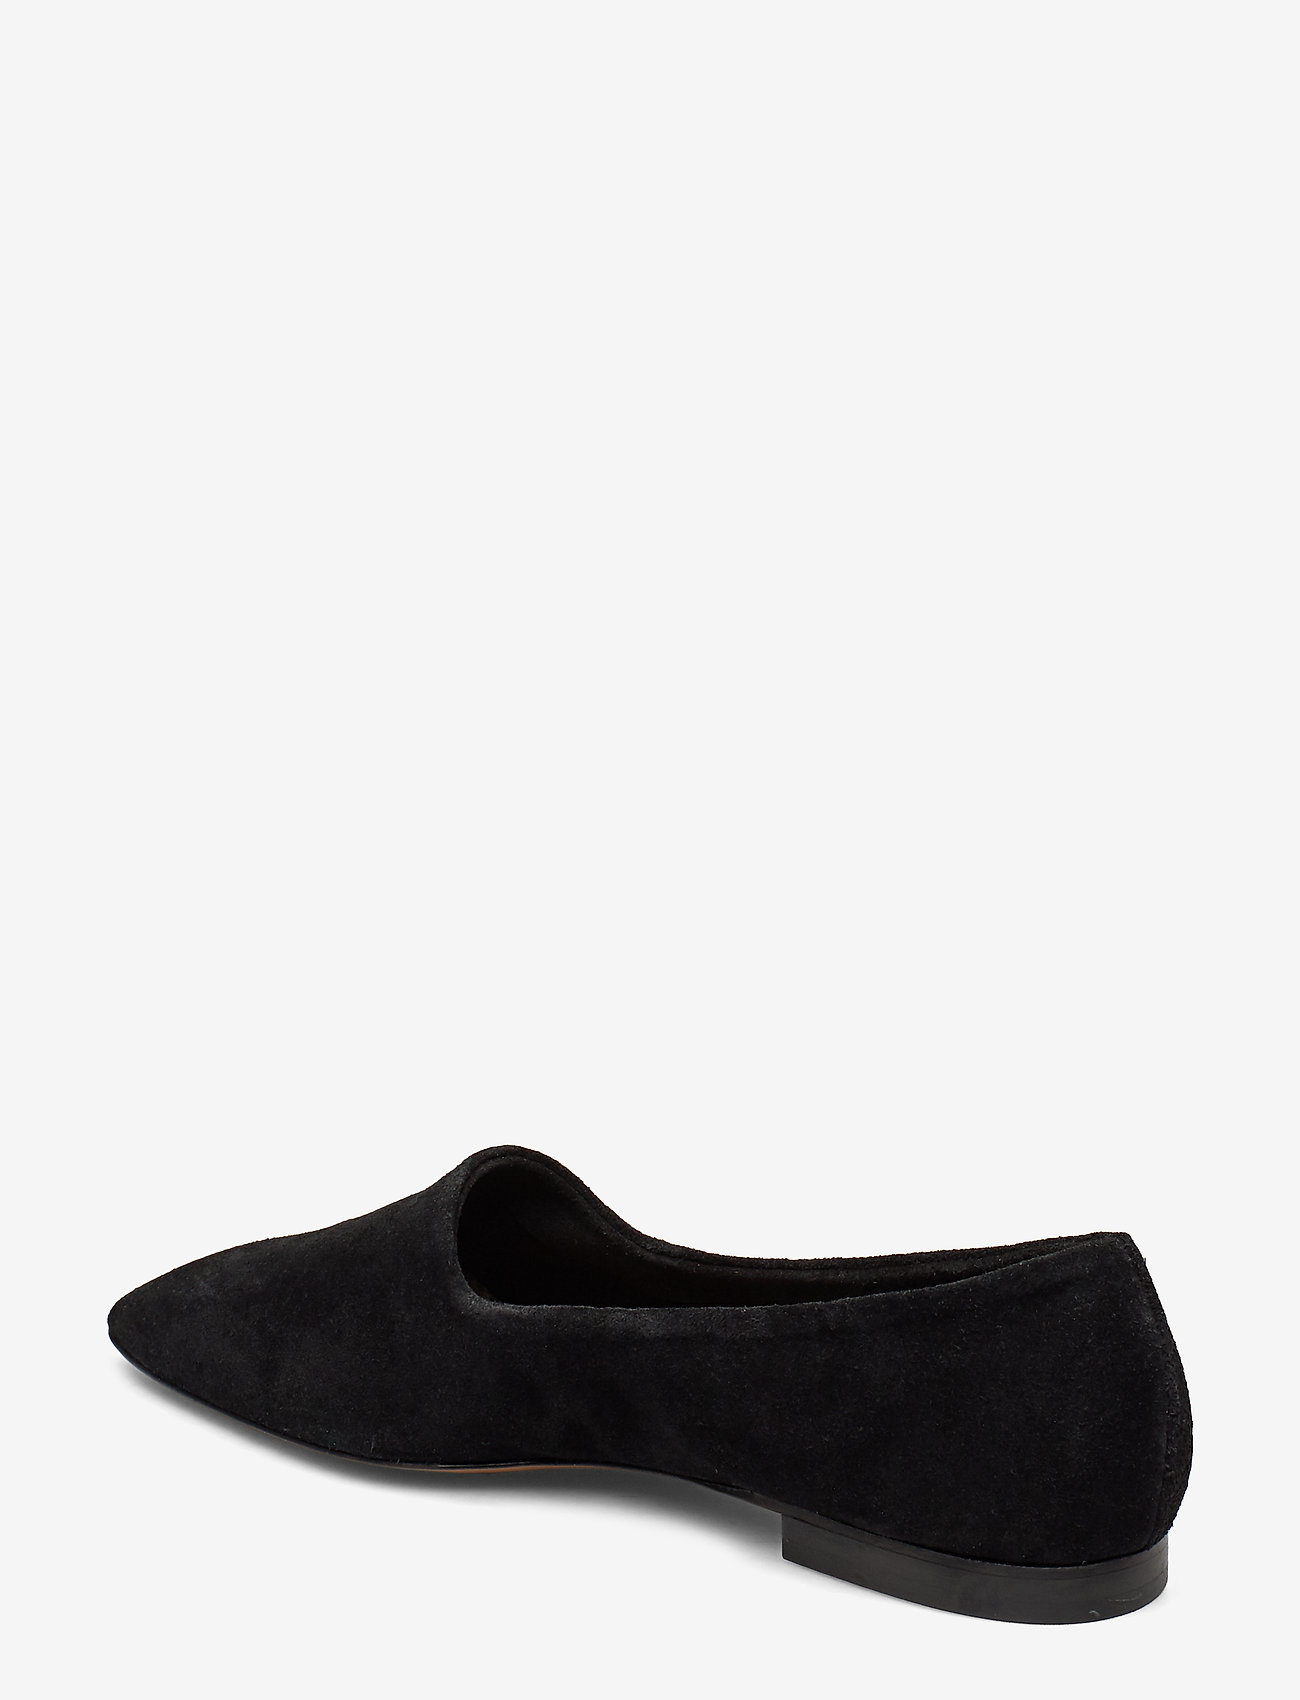 ATP Atelier - Andrano Black Suede - shoes - black - 2